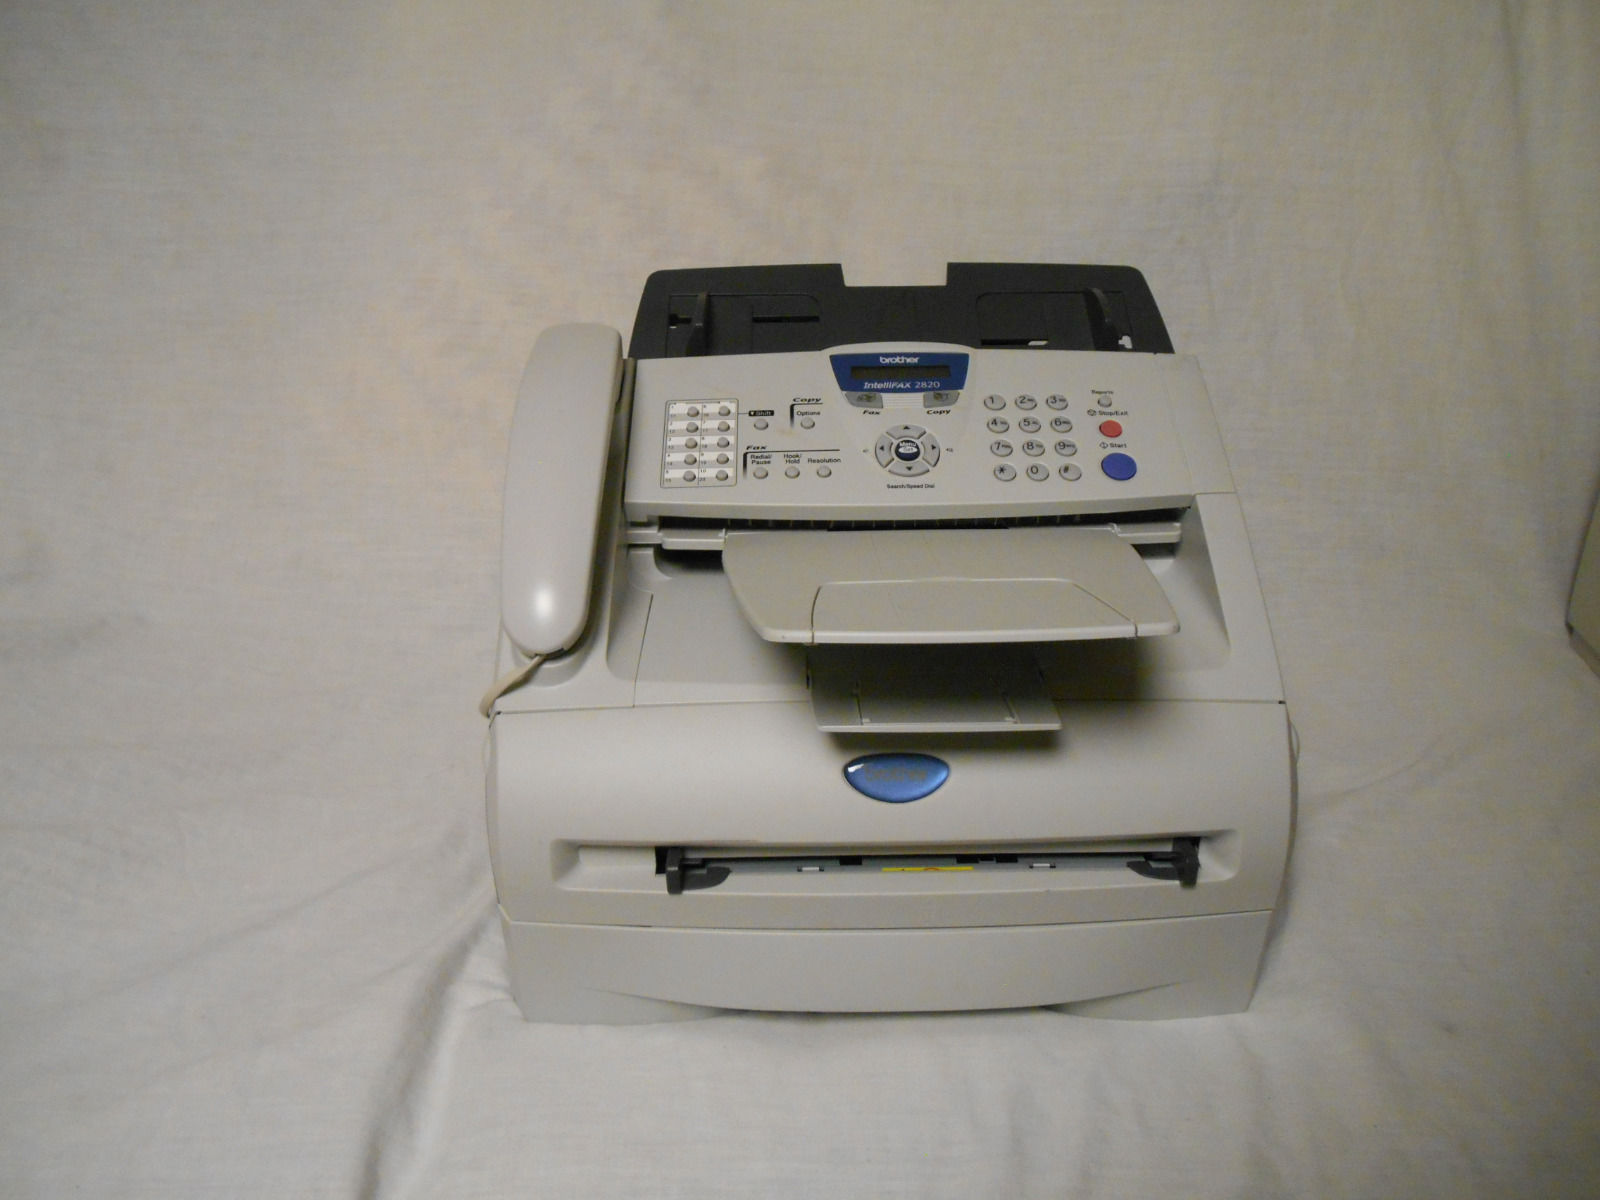 intellifax 2820 fax machine